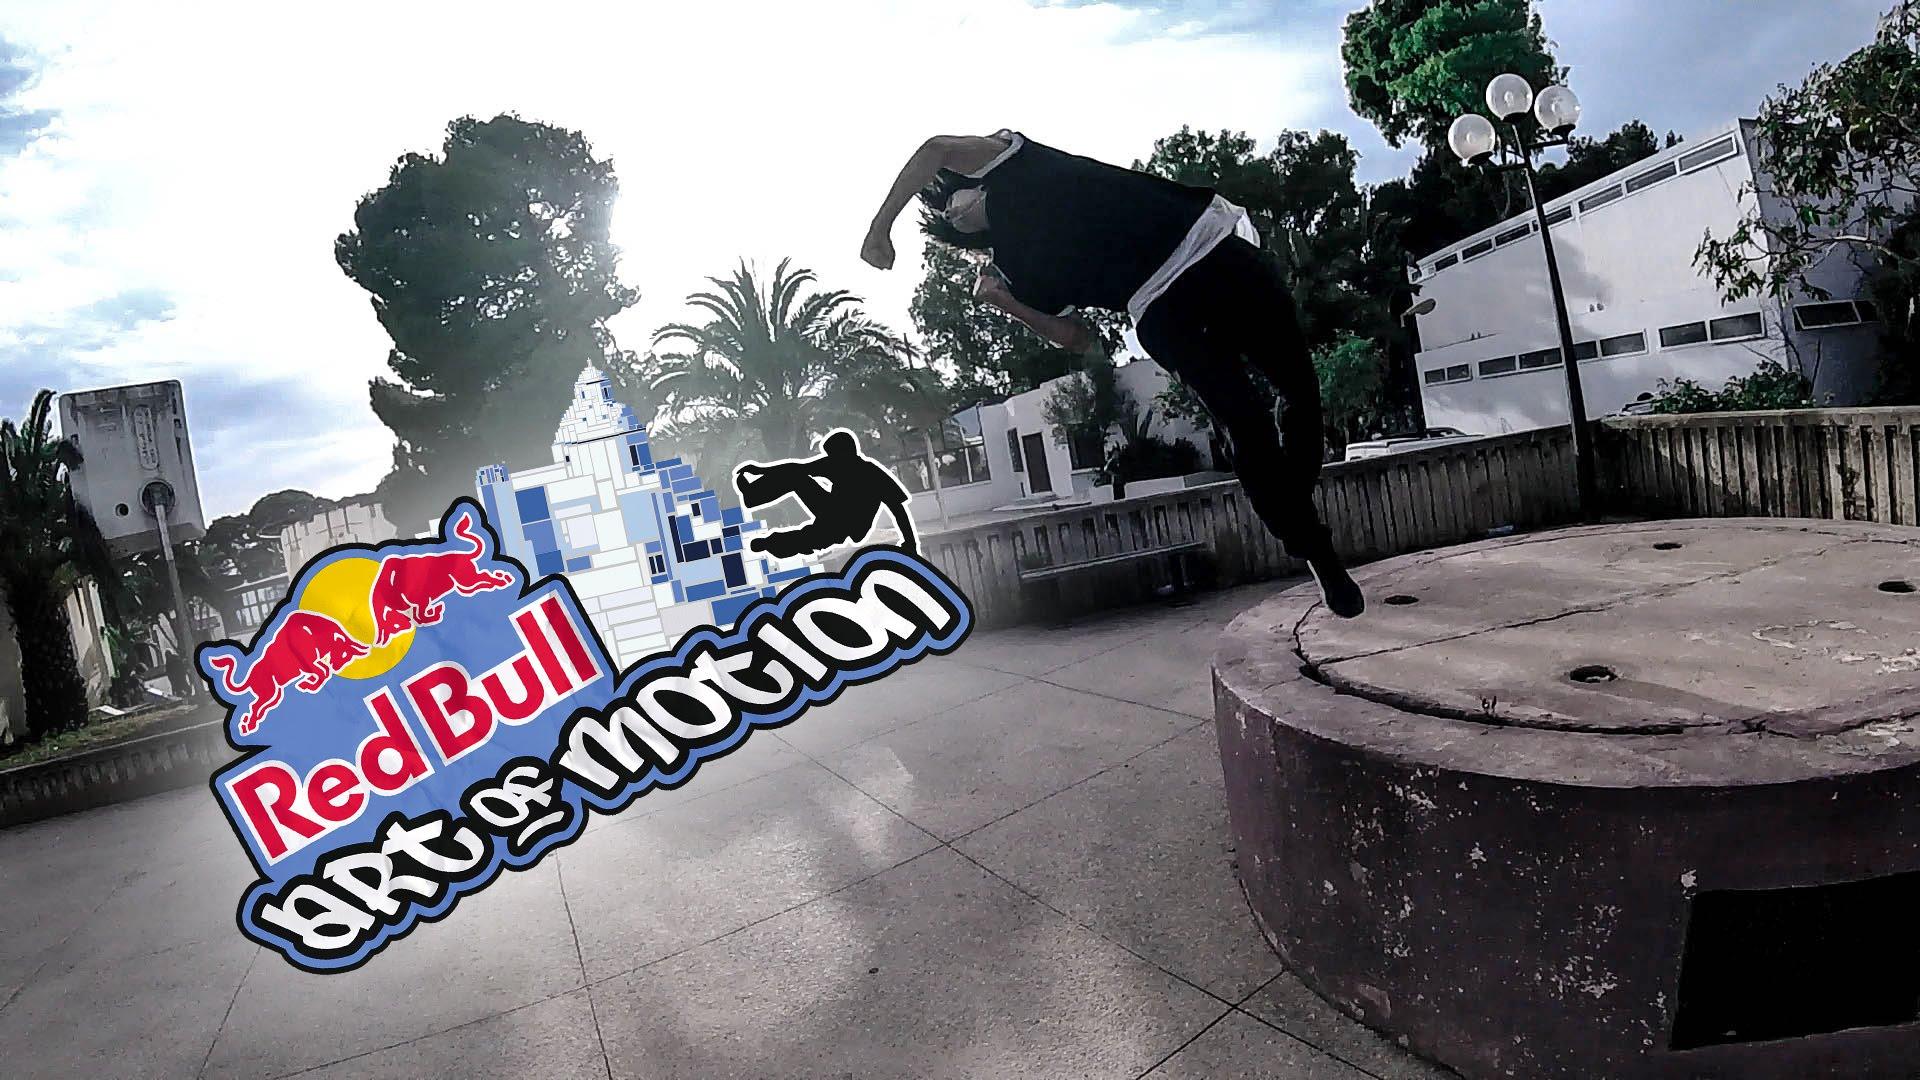 Guecem Abderrazak - Red Bull Art of Motion 2016 Online Qualifier ...